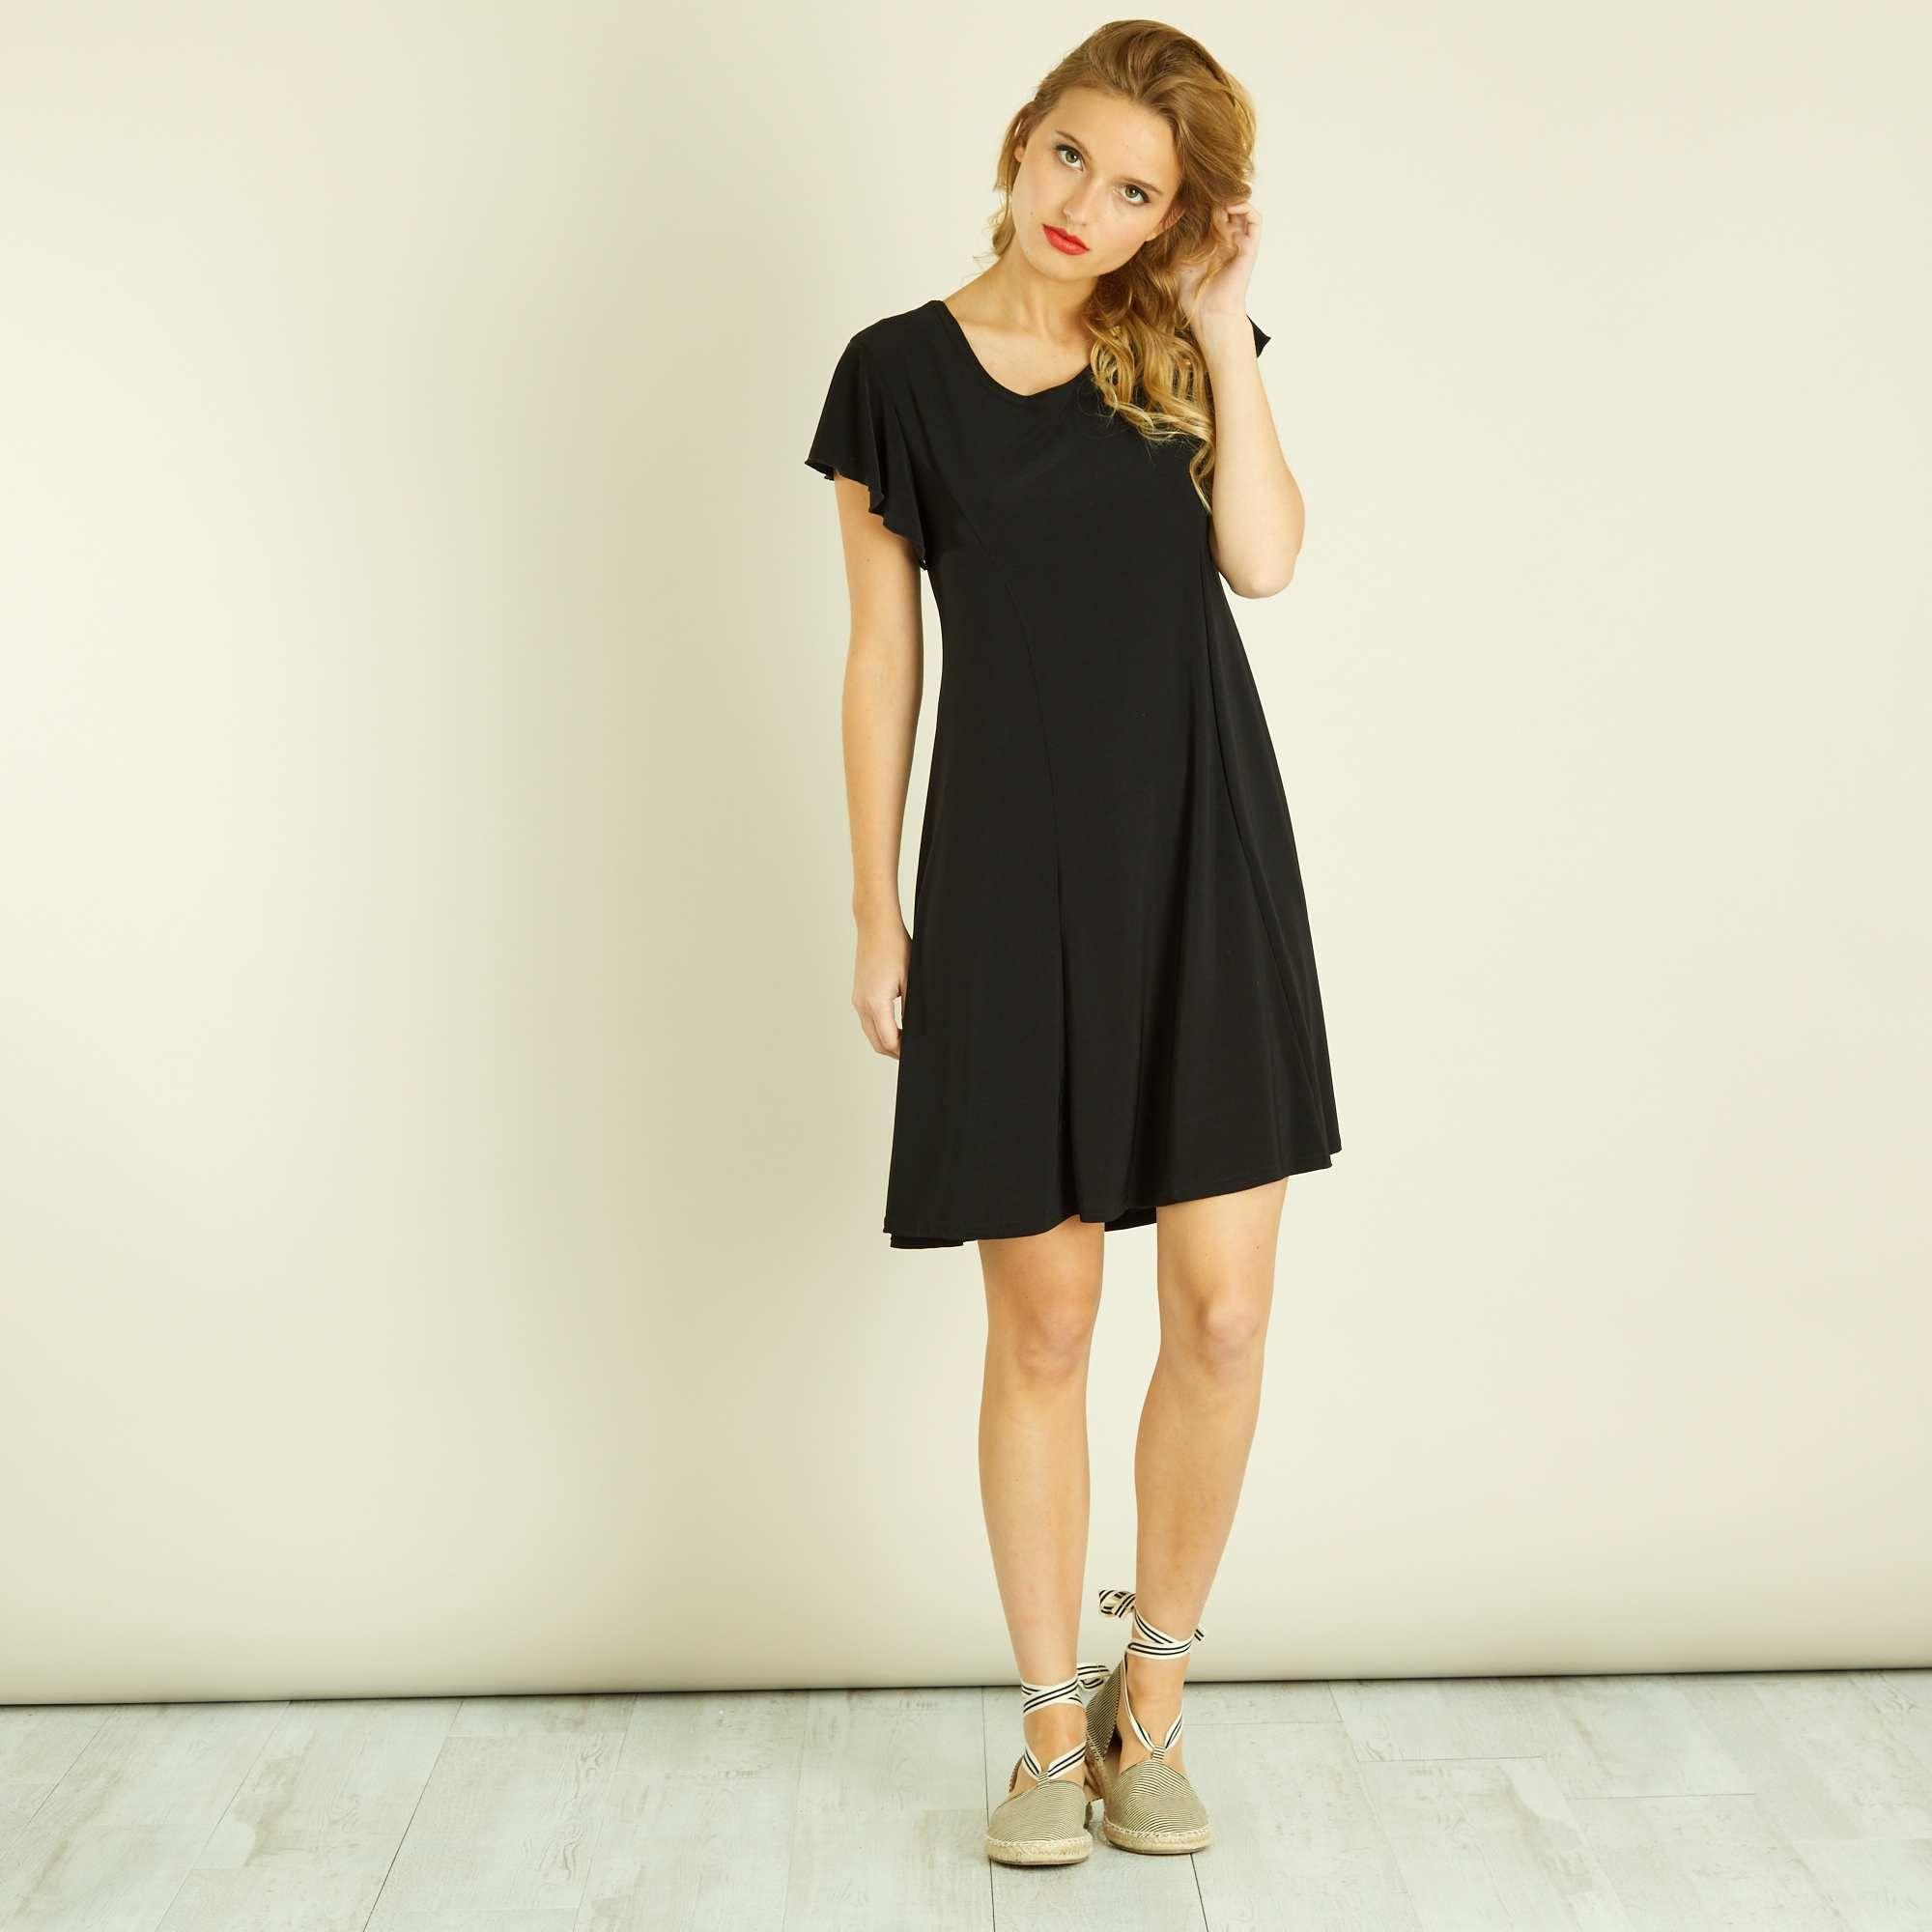 Abiti Da Sera Kiabi.Pin Su Little Black Dress